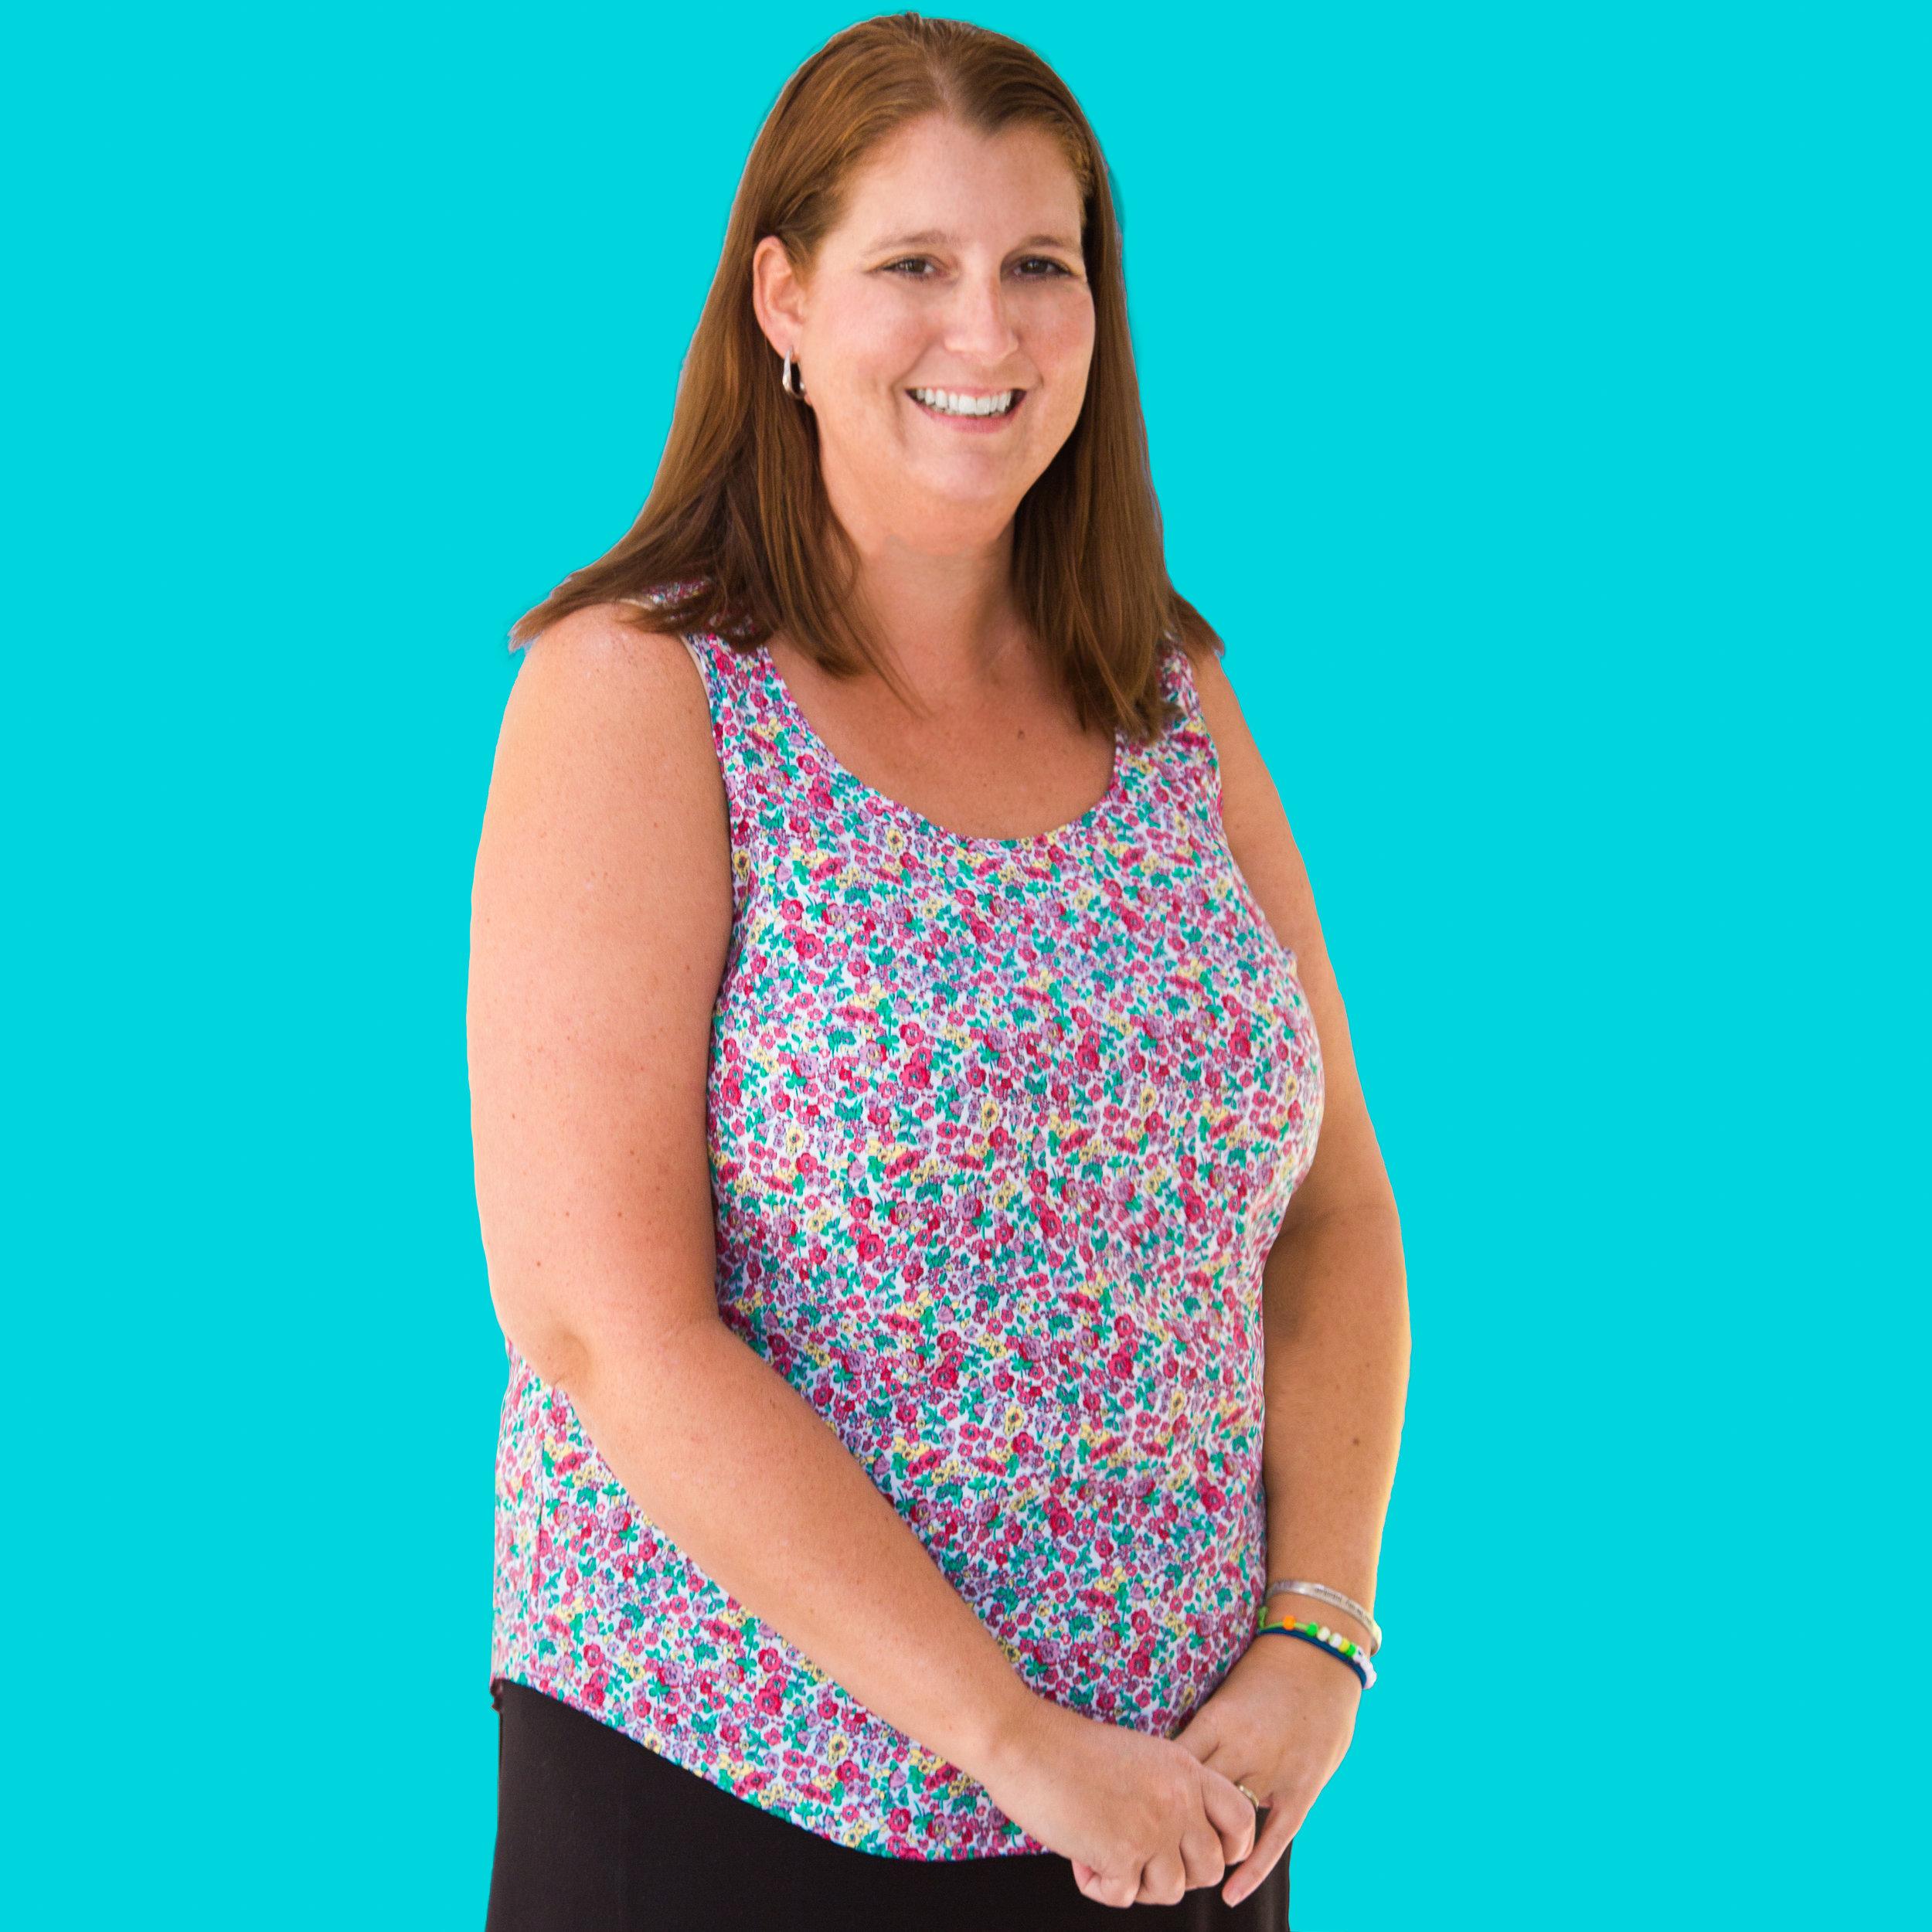 Melissa kautter | Senior reservations manager